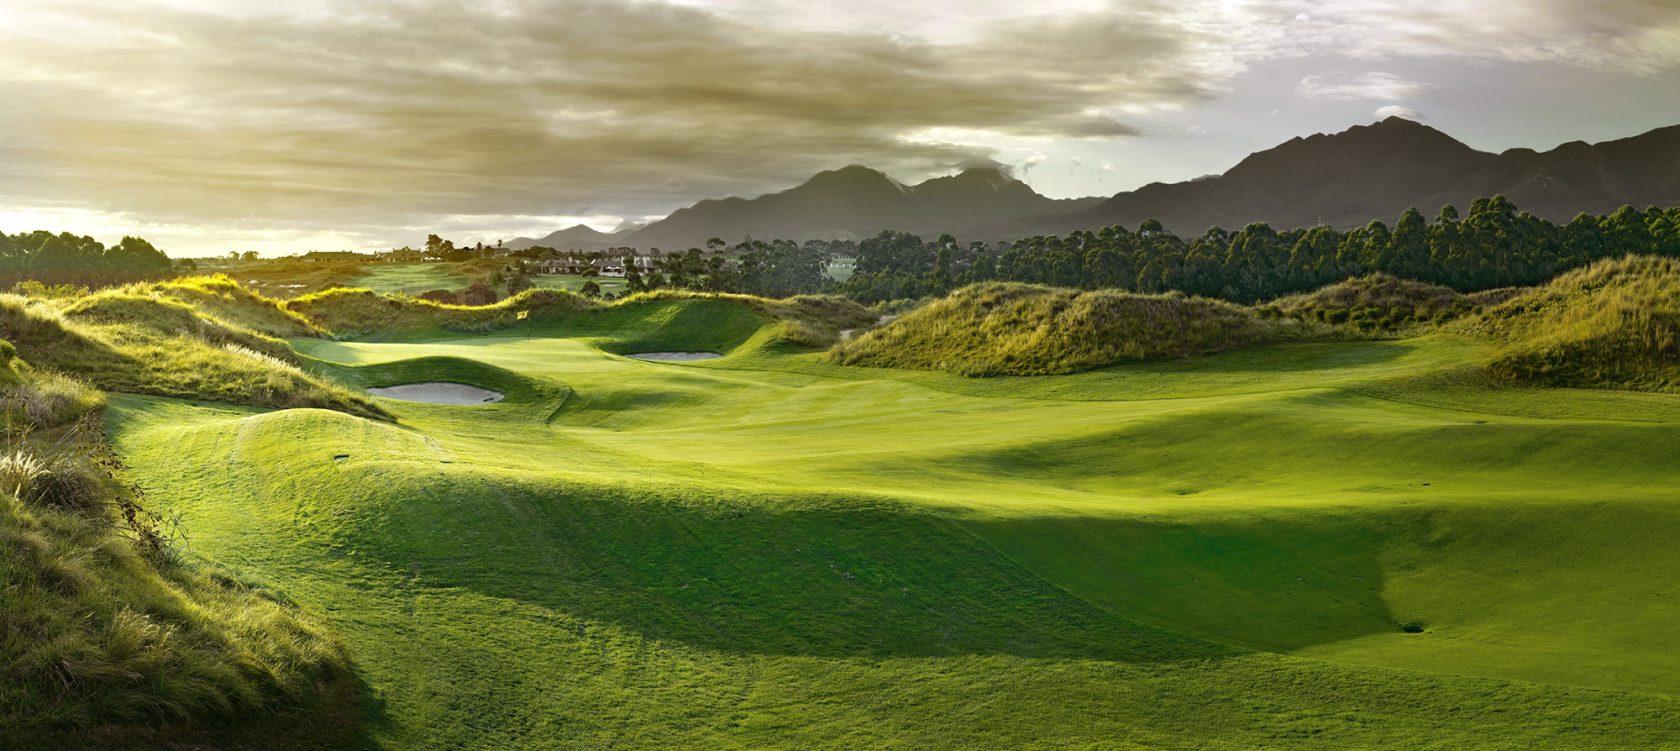 Rundreise/ Golfreise Südafrika – Fancourt/ The Links